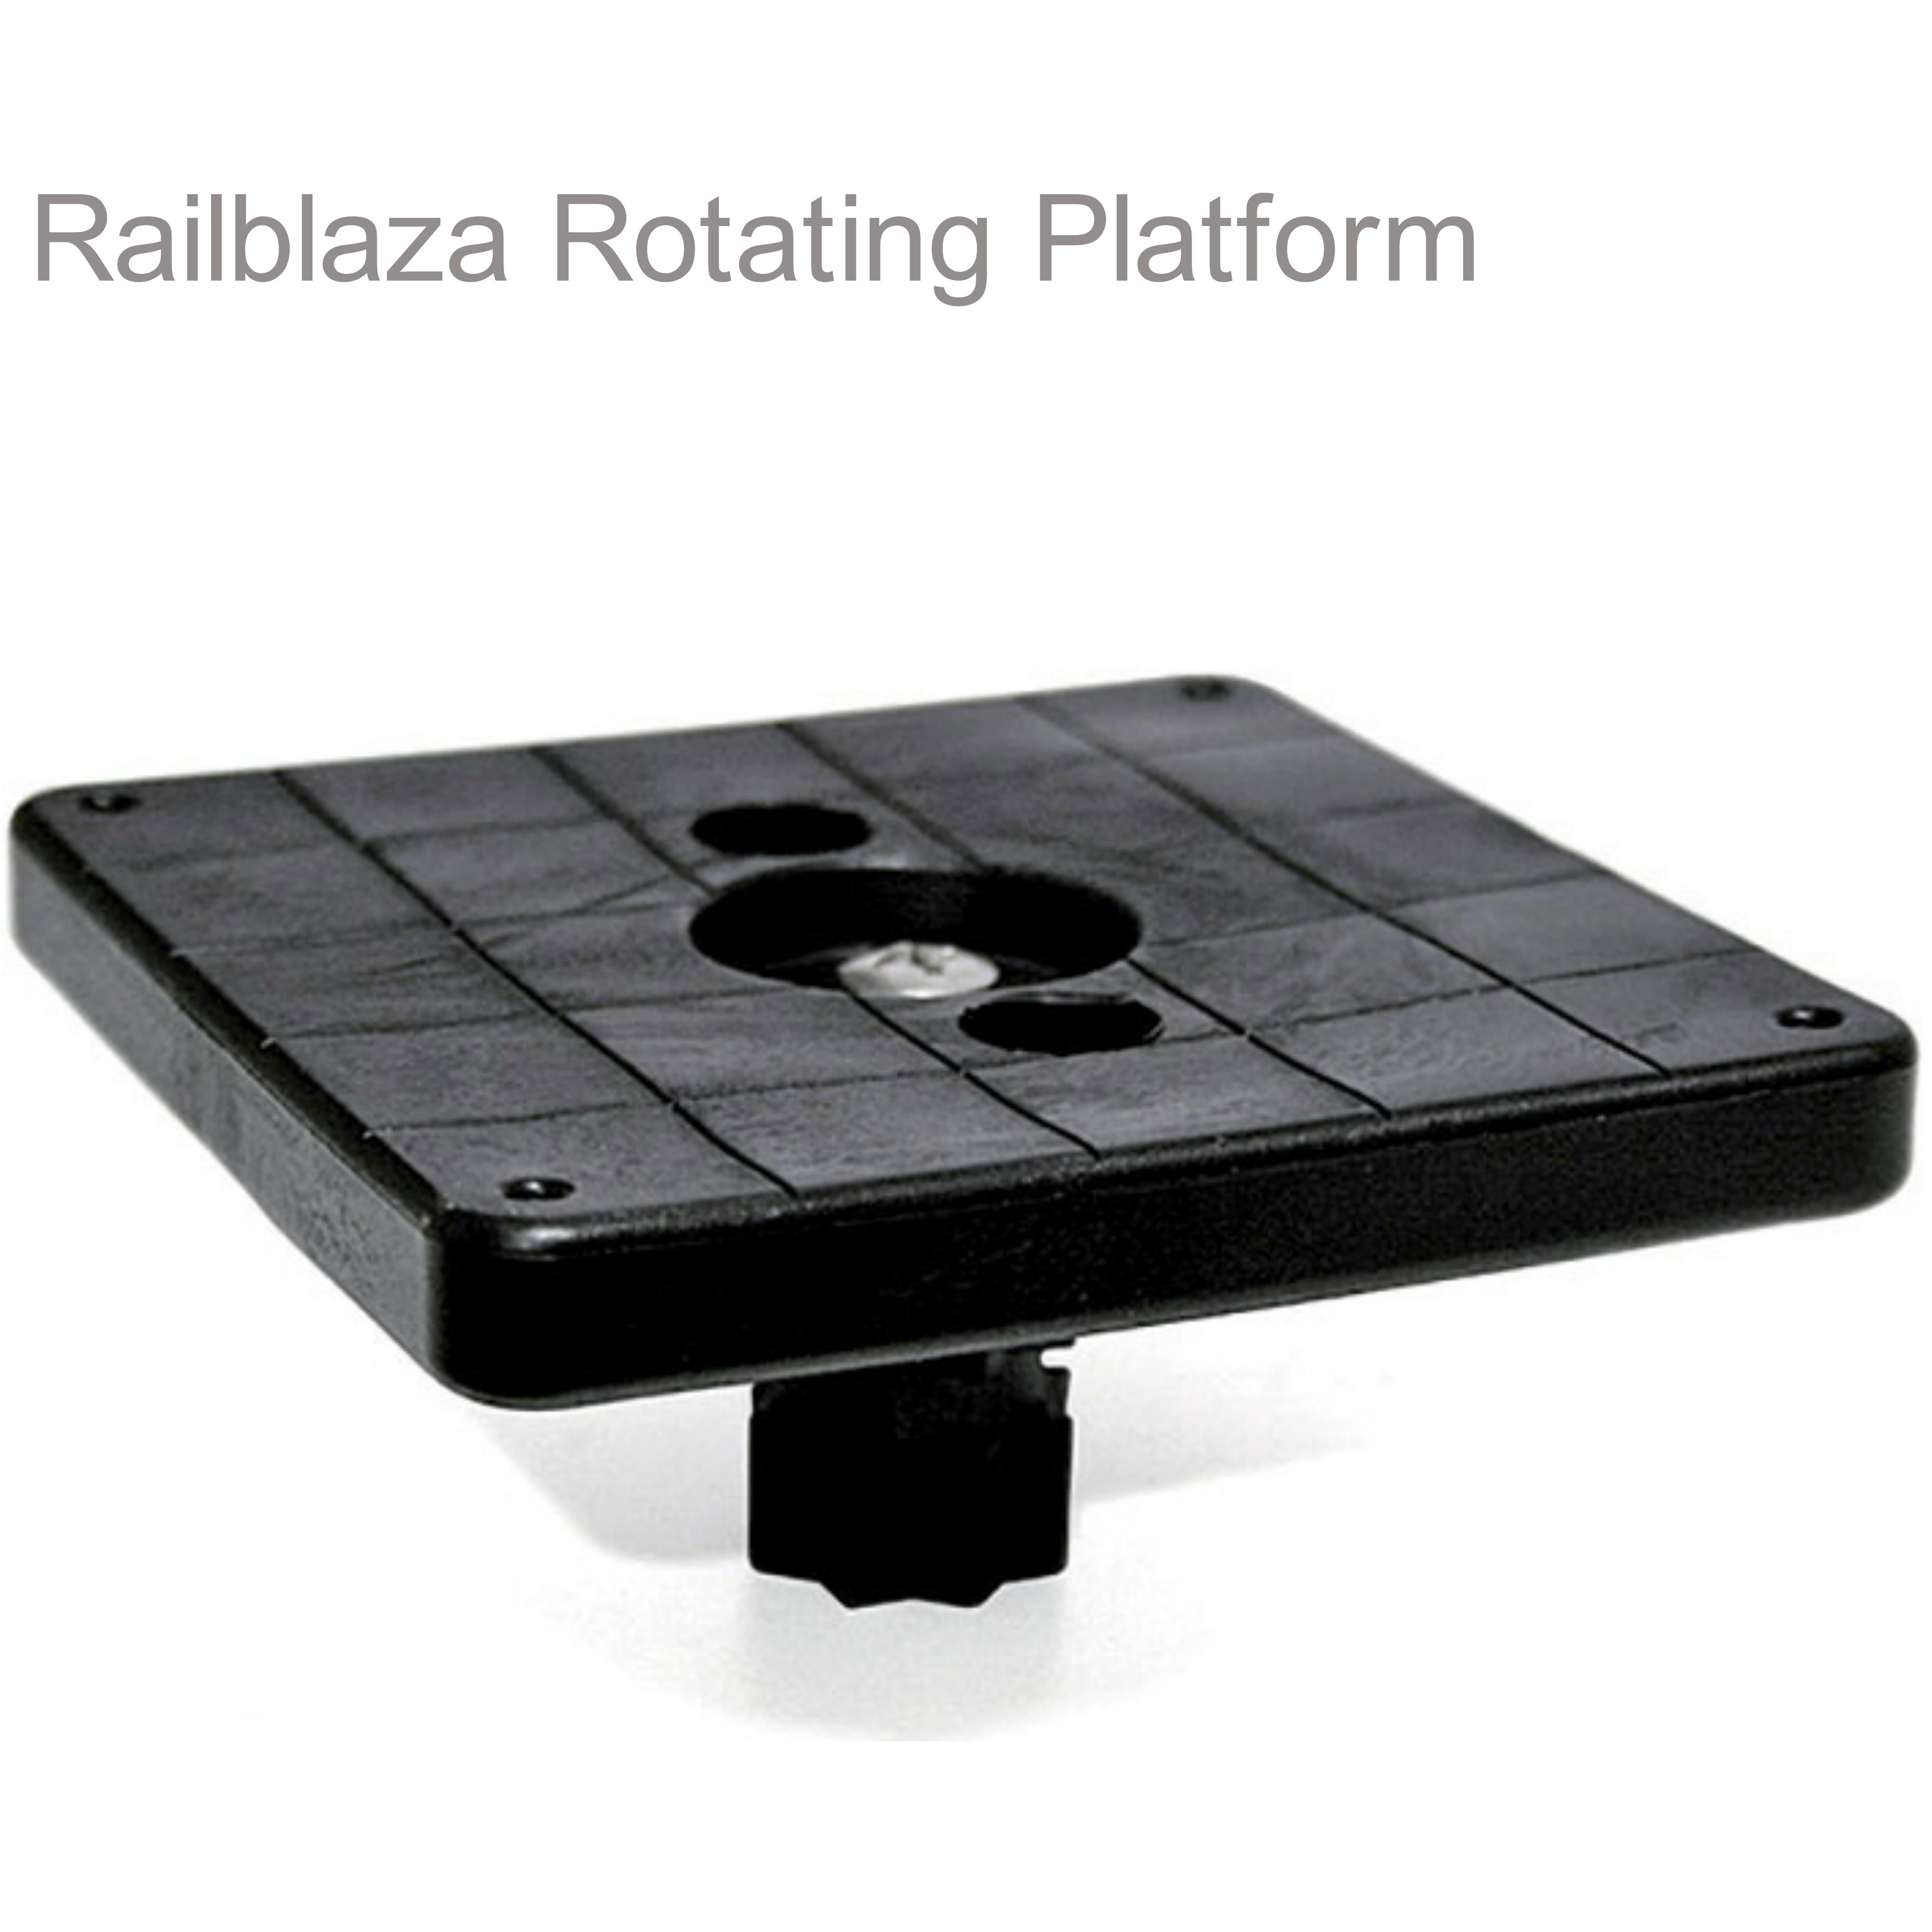 "Railblaza Platform Rotating 102mm Square - 4""|Turned 360°|Use for Kayak/Sailboats"